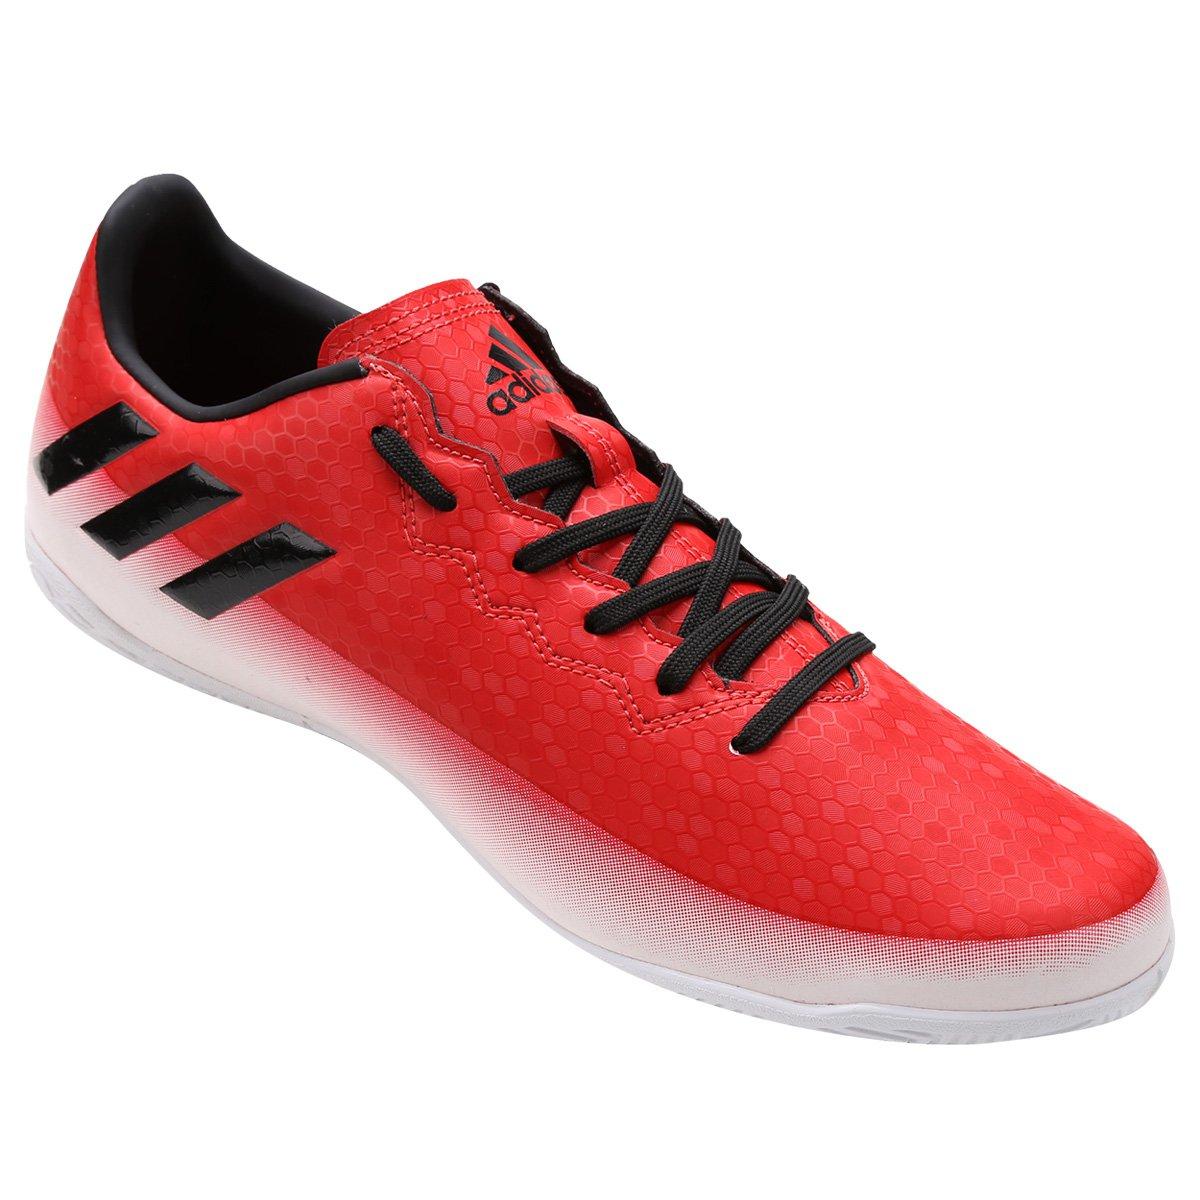 43c7fca7ec4f5 Chuteira Futsal Adidas Messi 164 In Masculina Vermelho E Branco